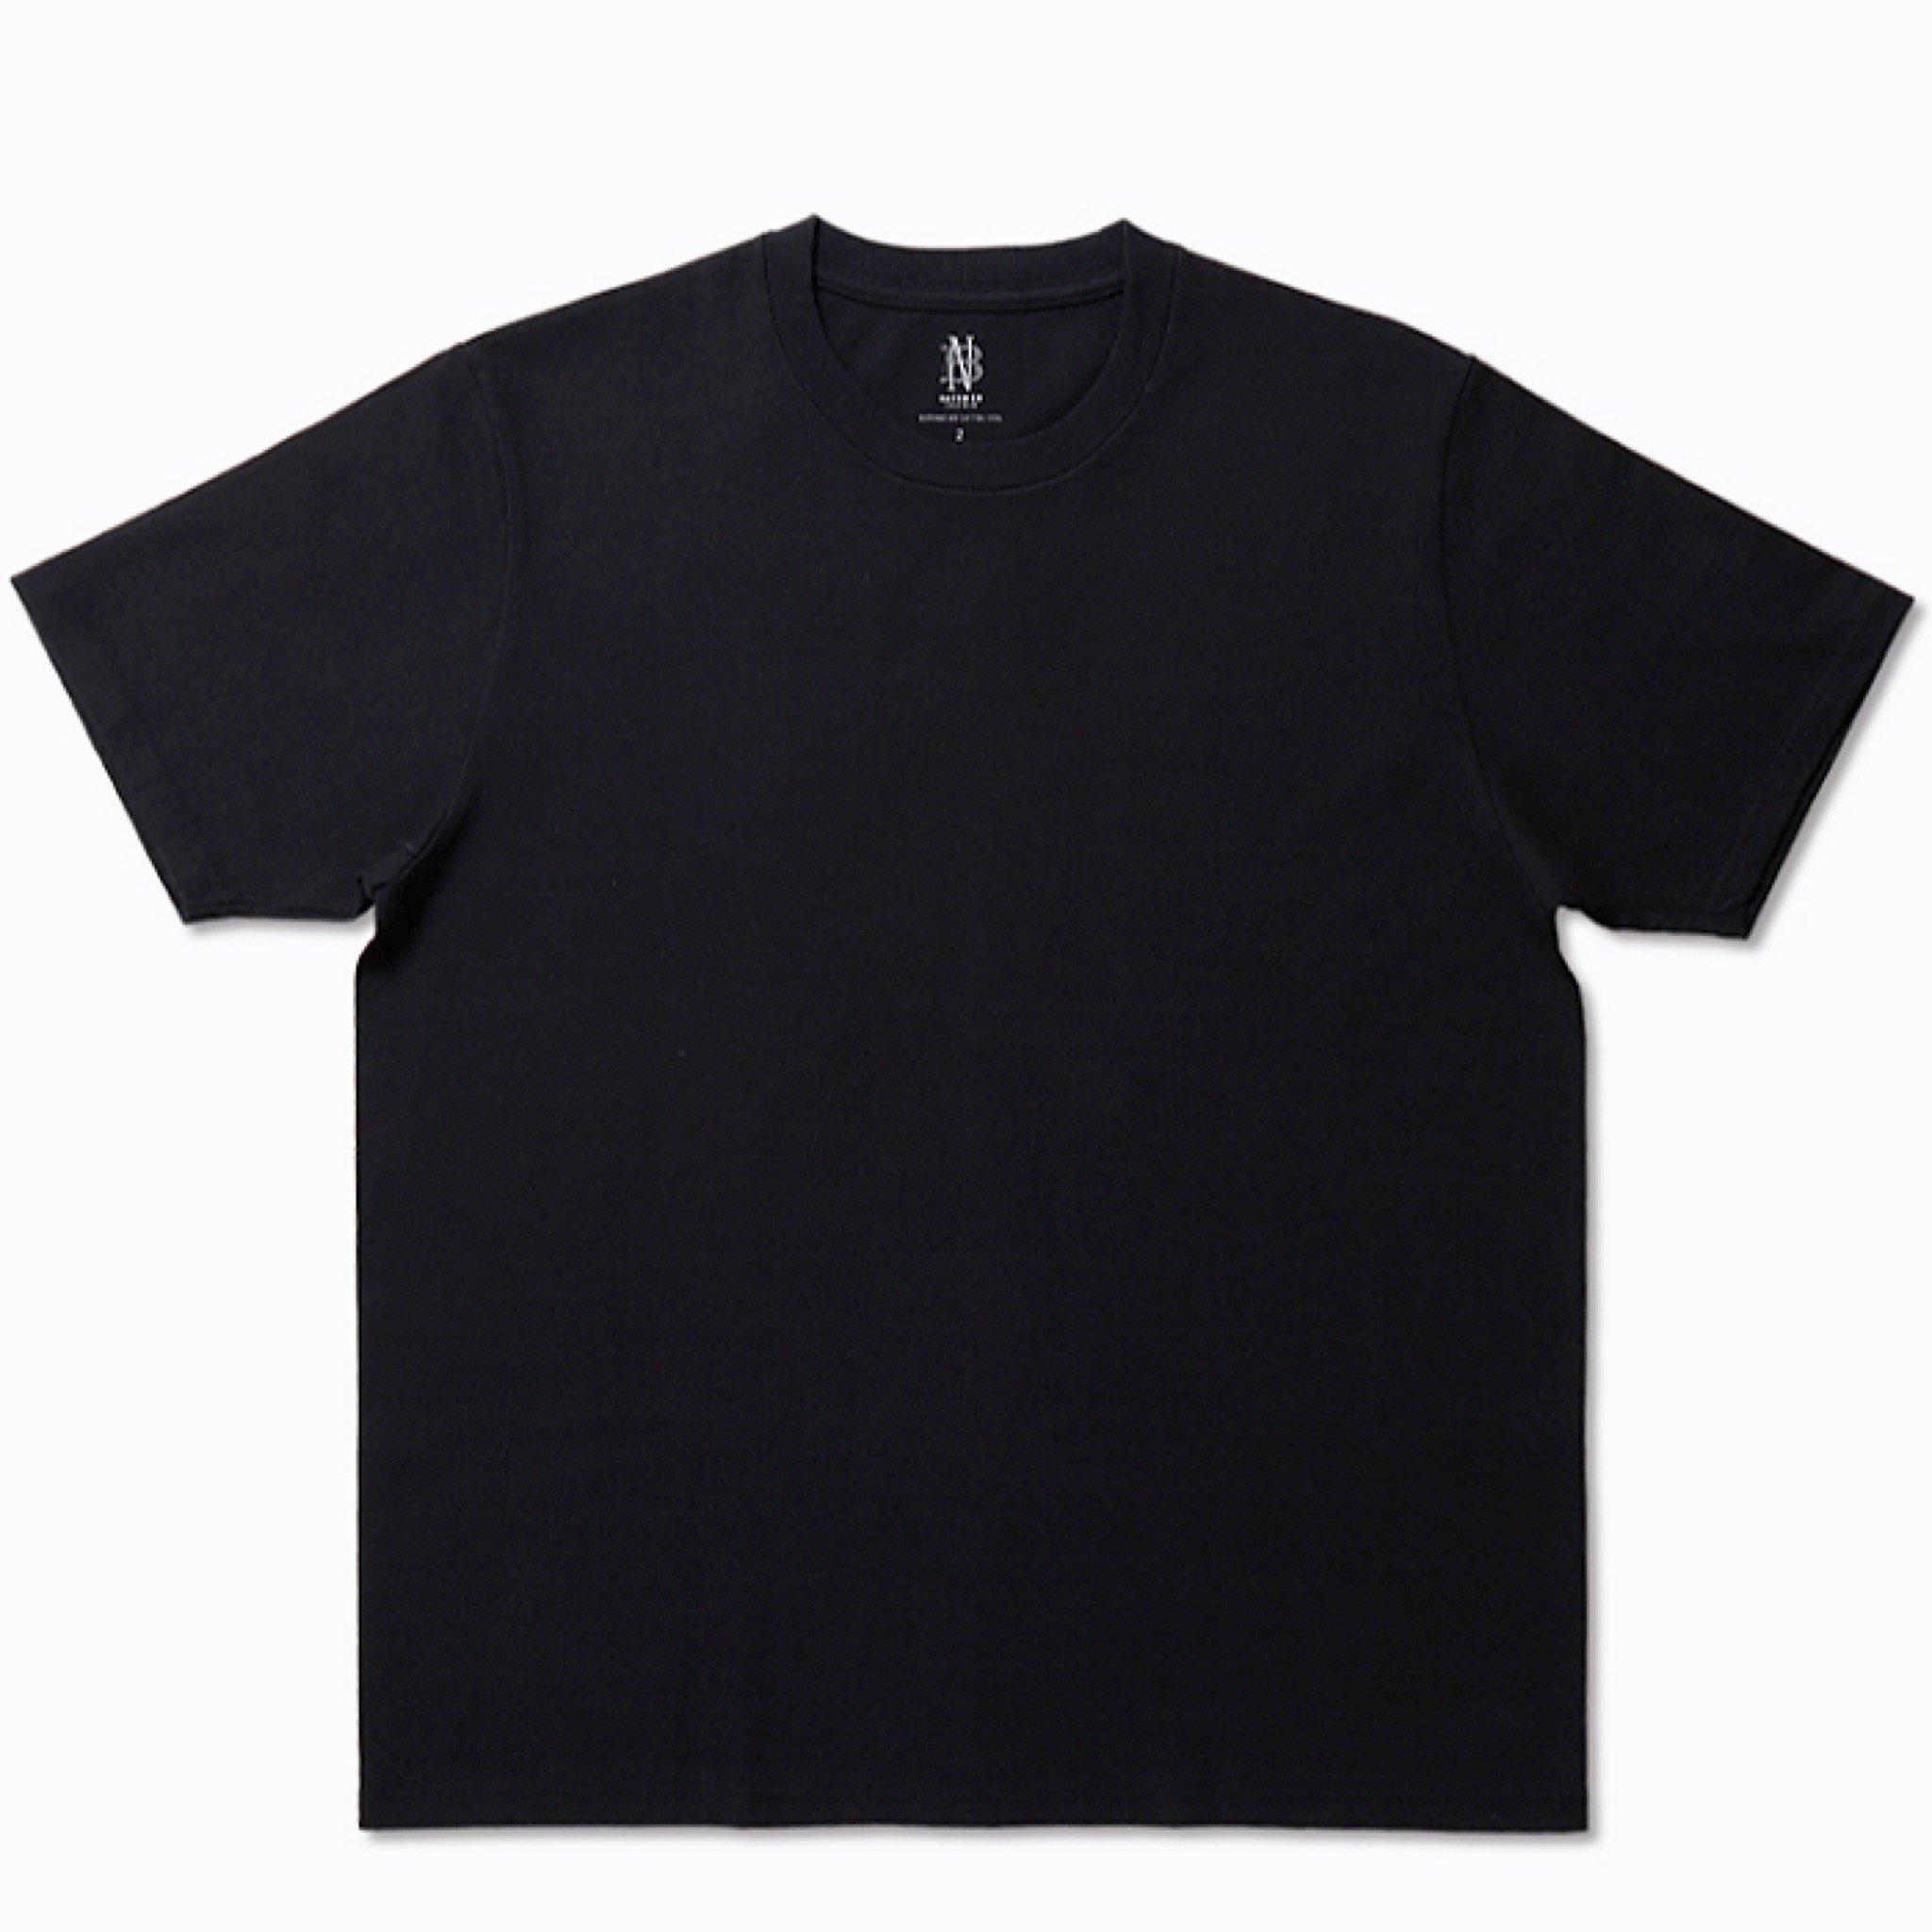 【BATONER】<br>ドライタッチ パックTシャツ(MEN'S)